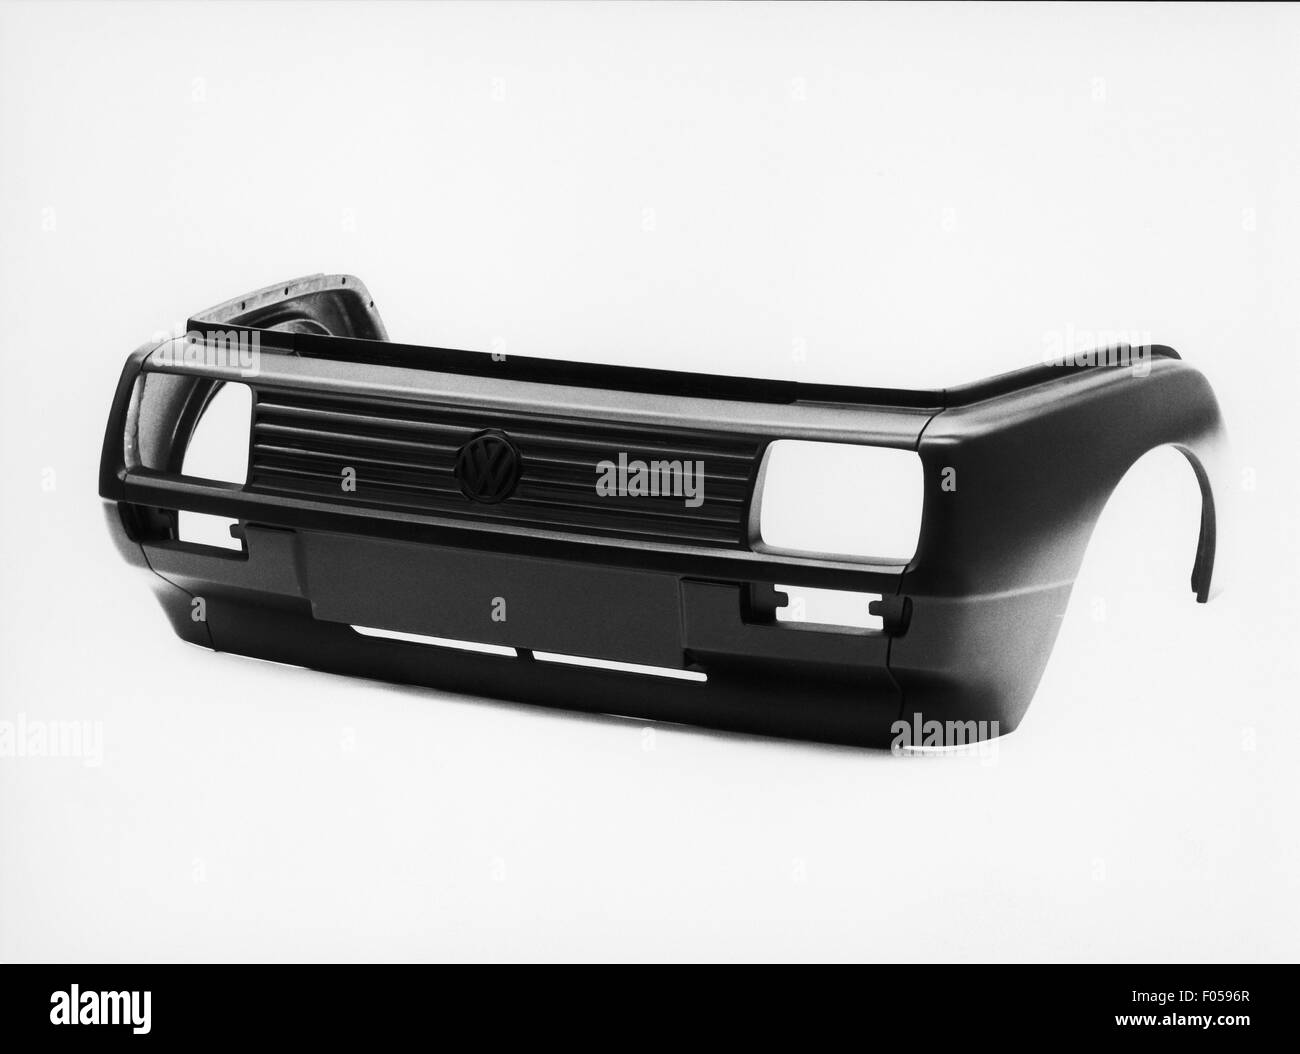 vw golf mk2 radiator grill and front bumper 1980s stock. Black Bedroom Furniture Sets. Home Design Ideas